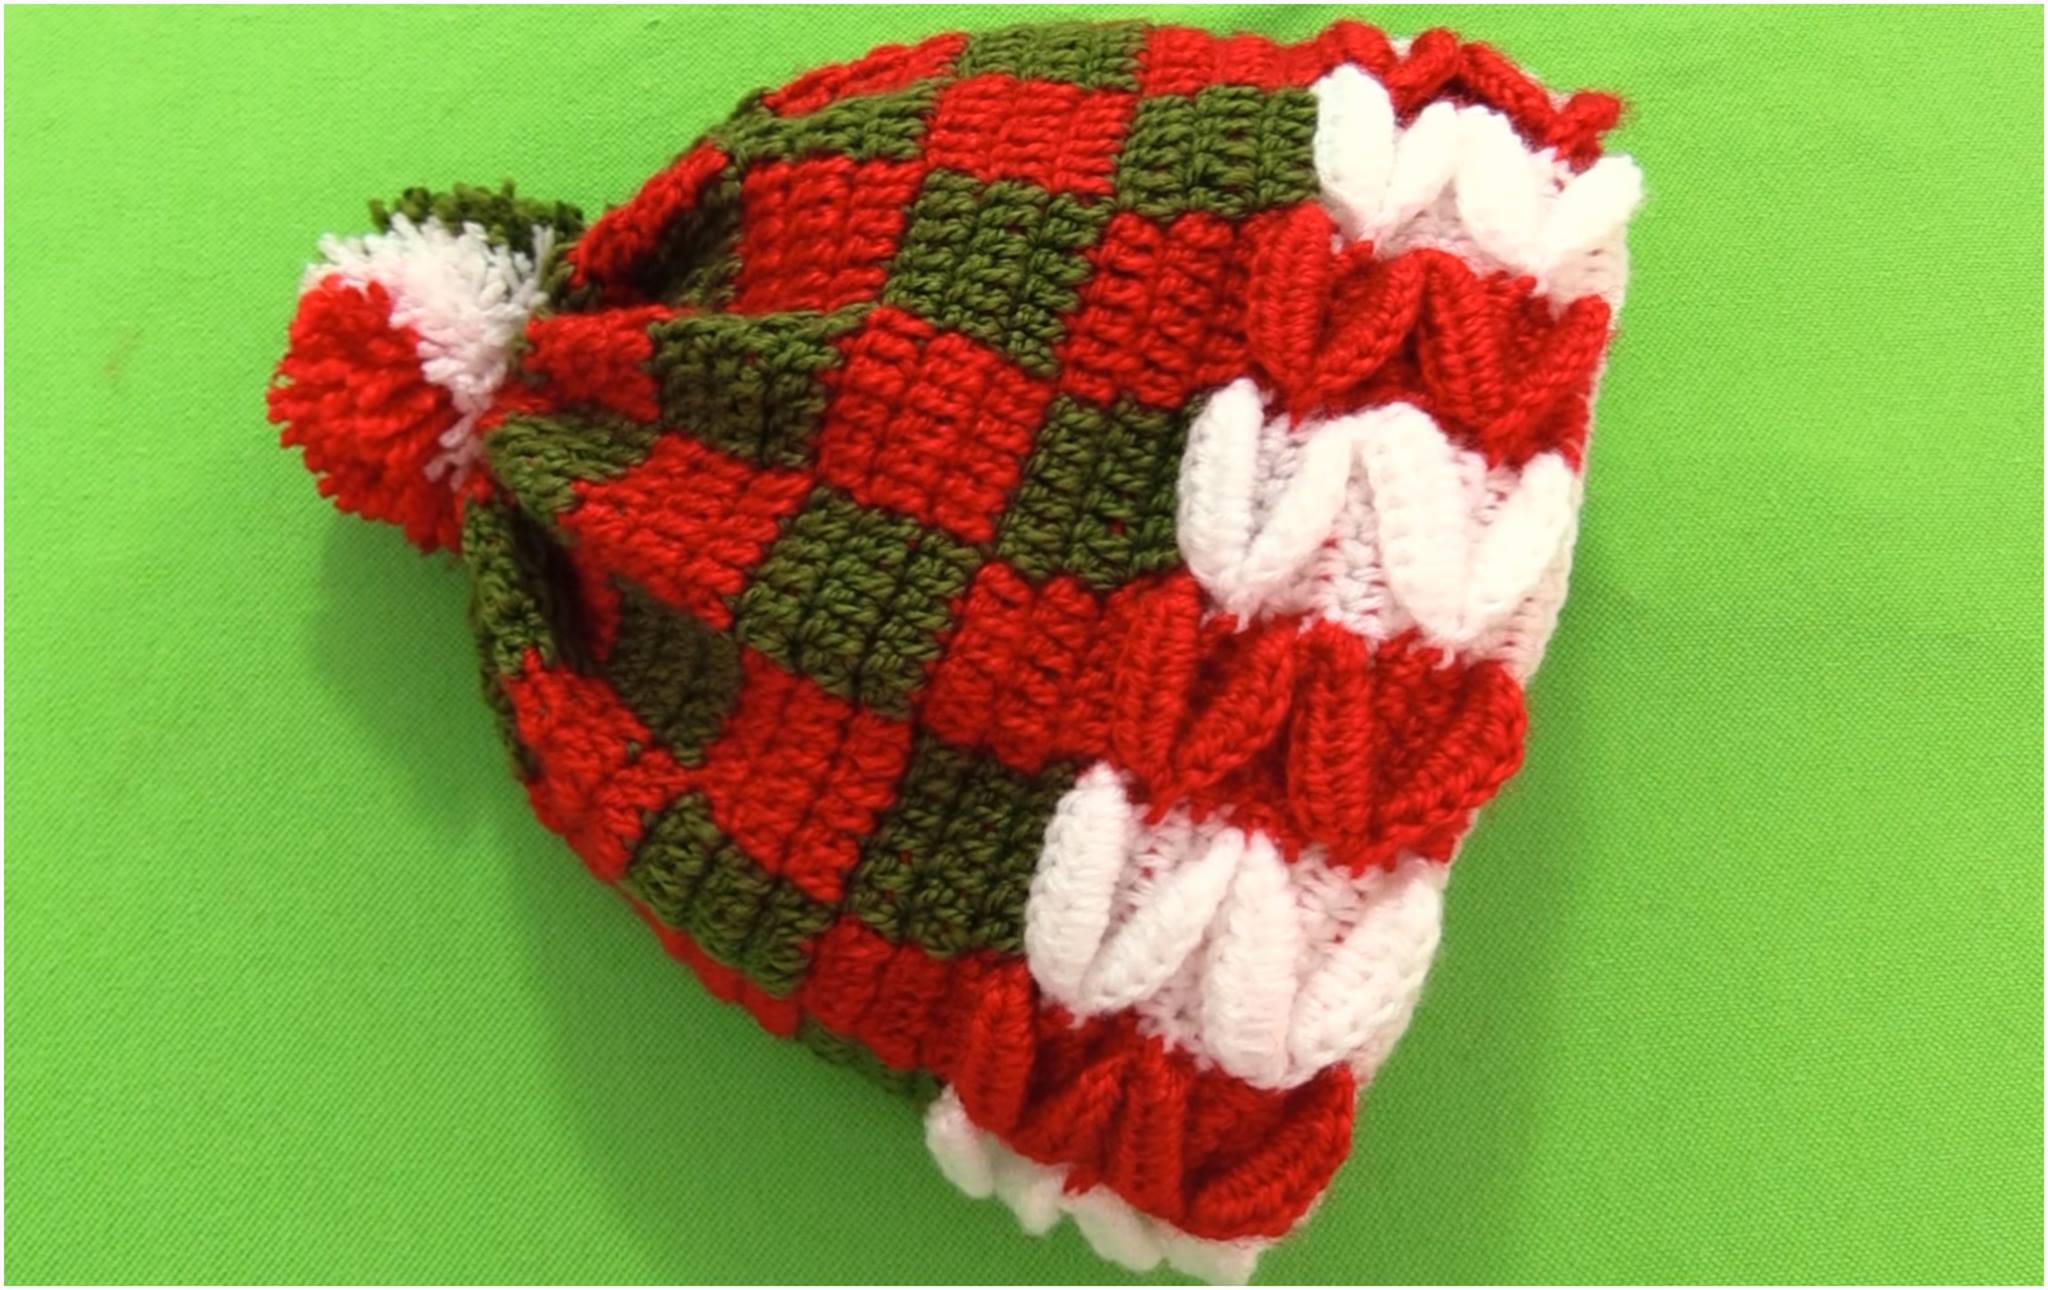 Crochet 3D Christmas Beanie Hat